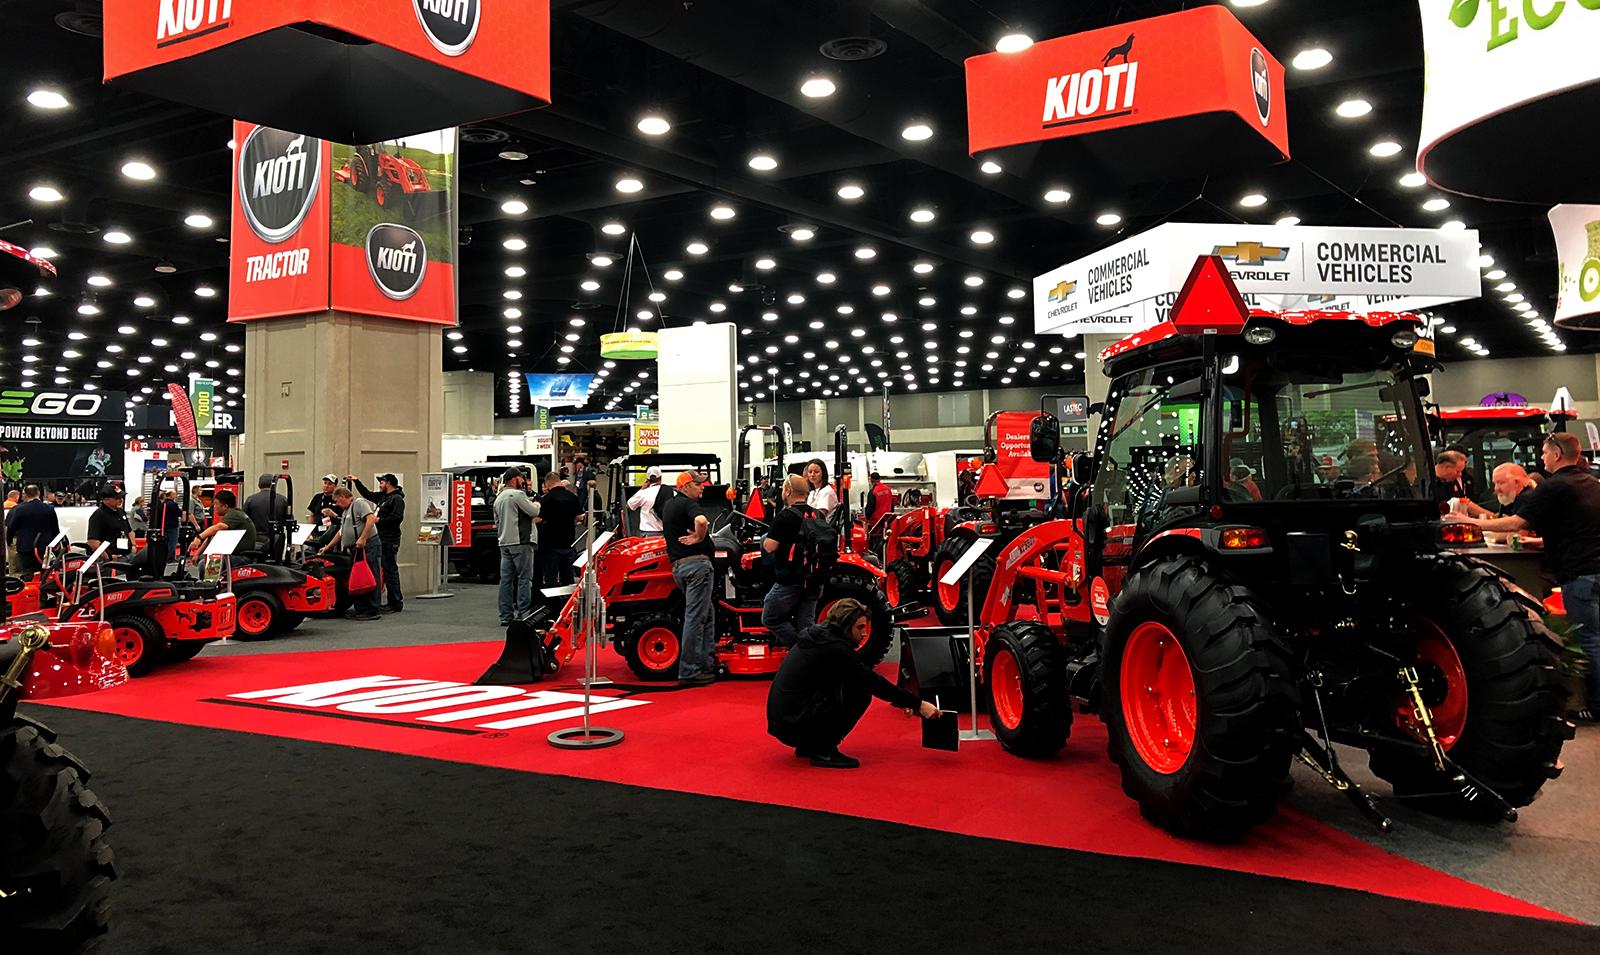 gie-expo-kioti-tractor-display